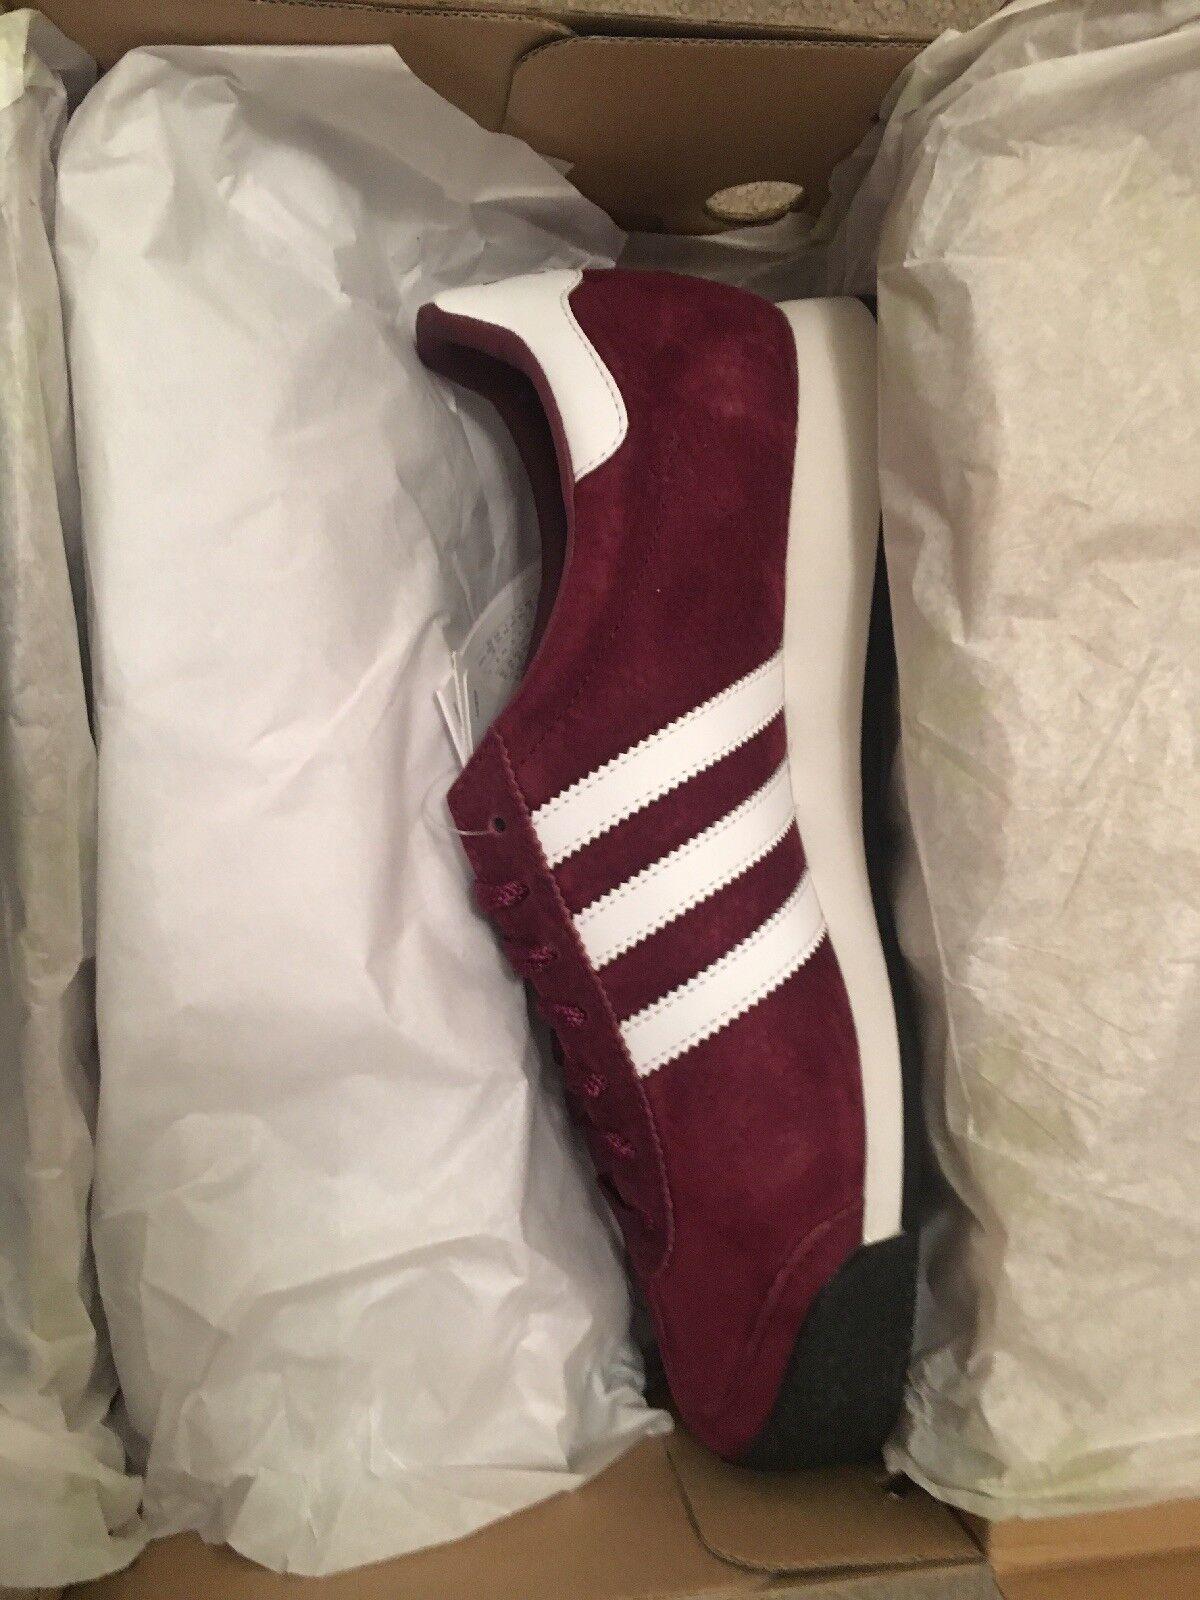 Adidas Samoa Vintage Maroon Größe 8 Deadstock 80s Retro Football Casuals